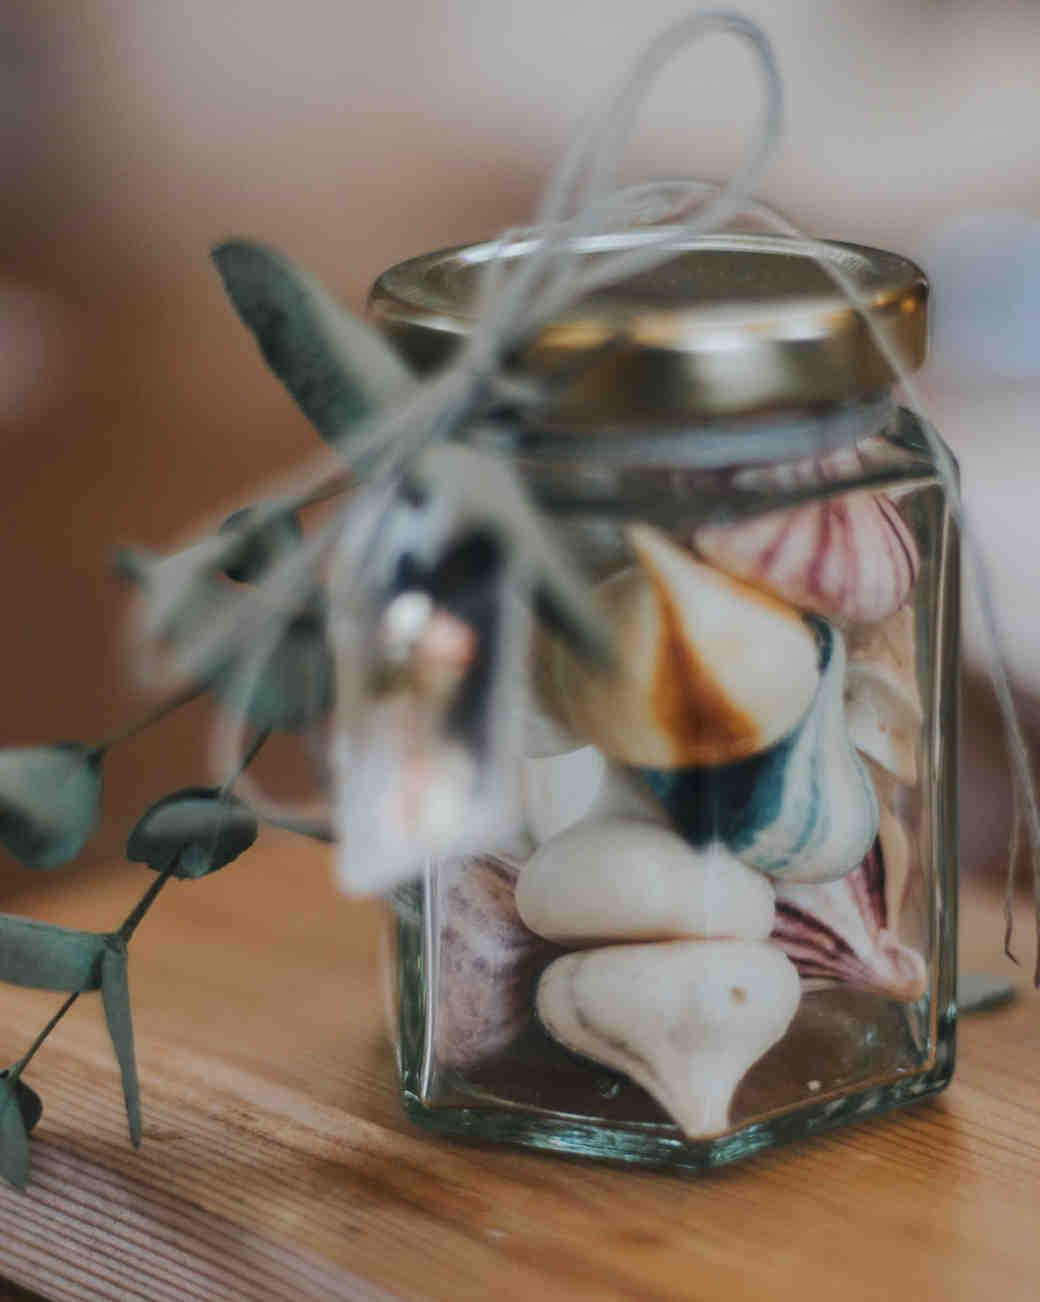 Shell-Like Meringues in a Jar